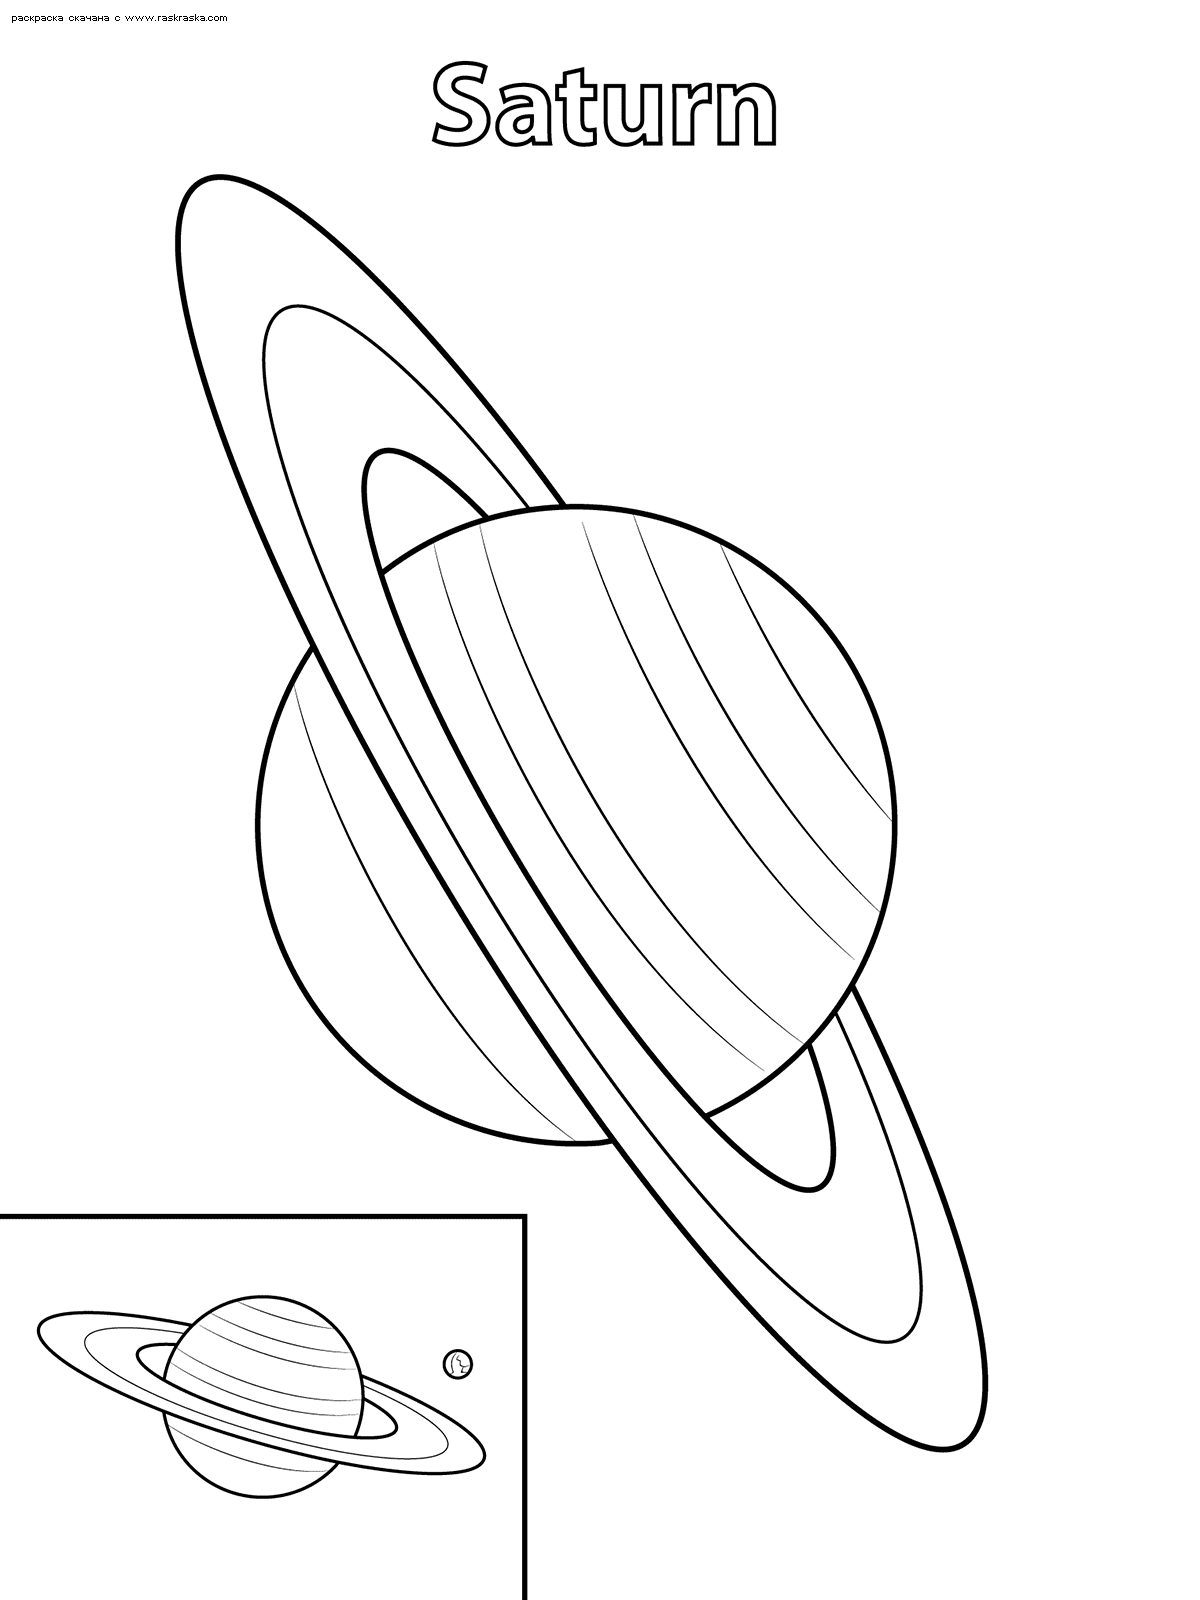 Раскраска Планета Сатурн. Раскраска сатурн